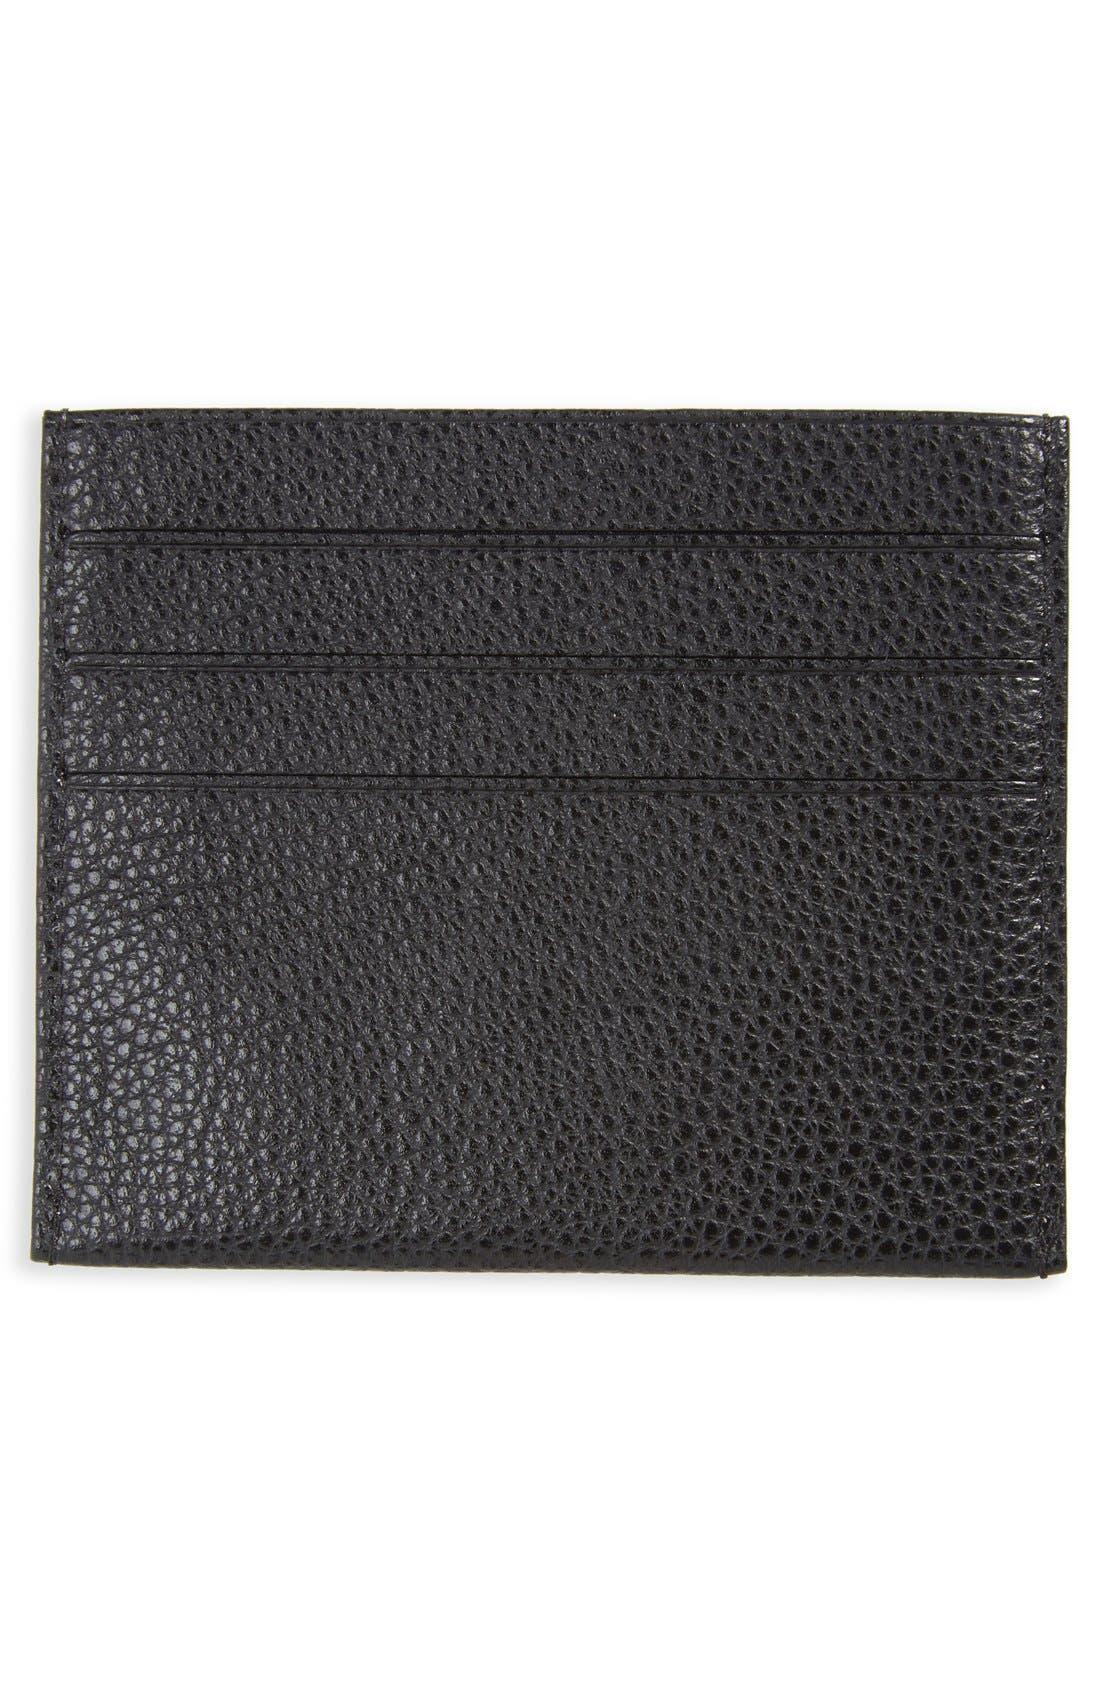 'Le Foulonne' Pebbled Leather Card Holder,                             Alternate thumbnail 2, color,                             BLACK